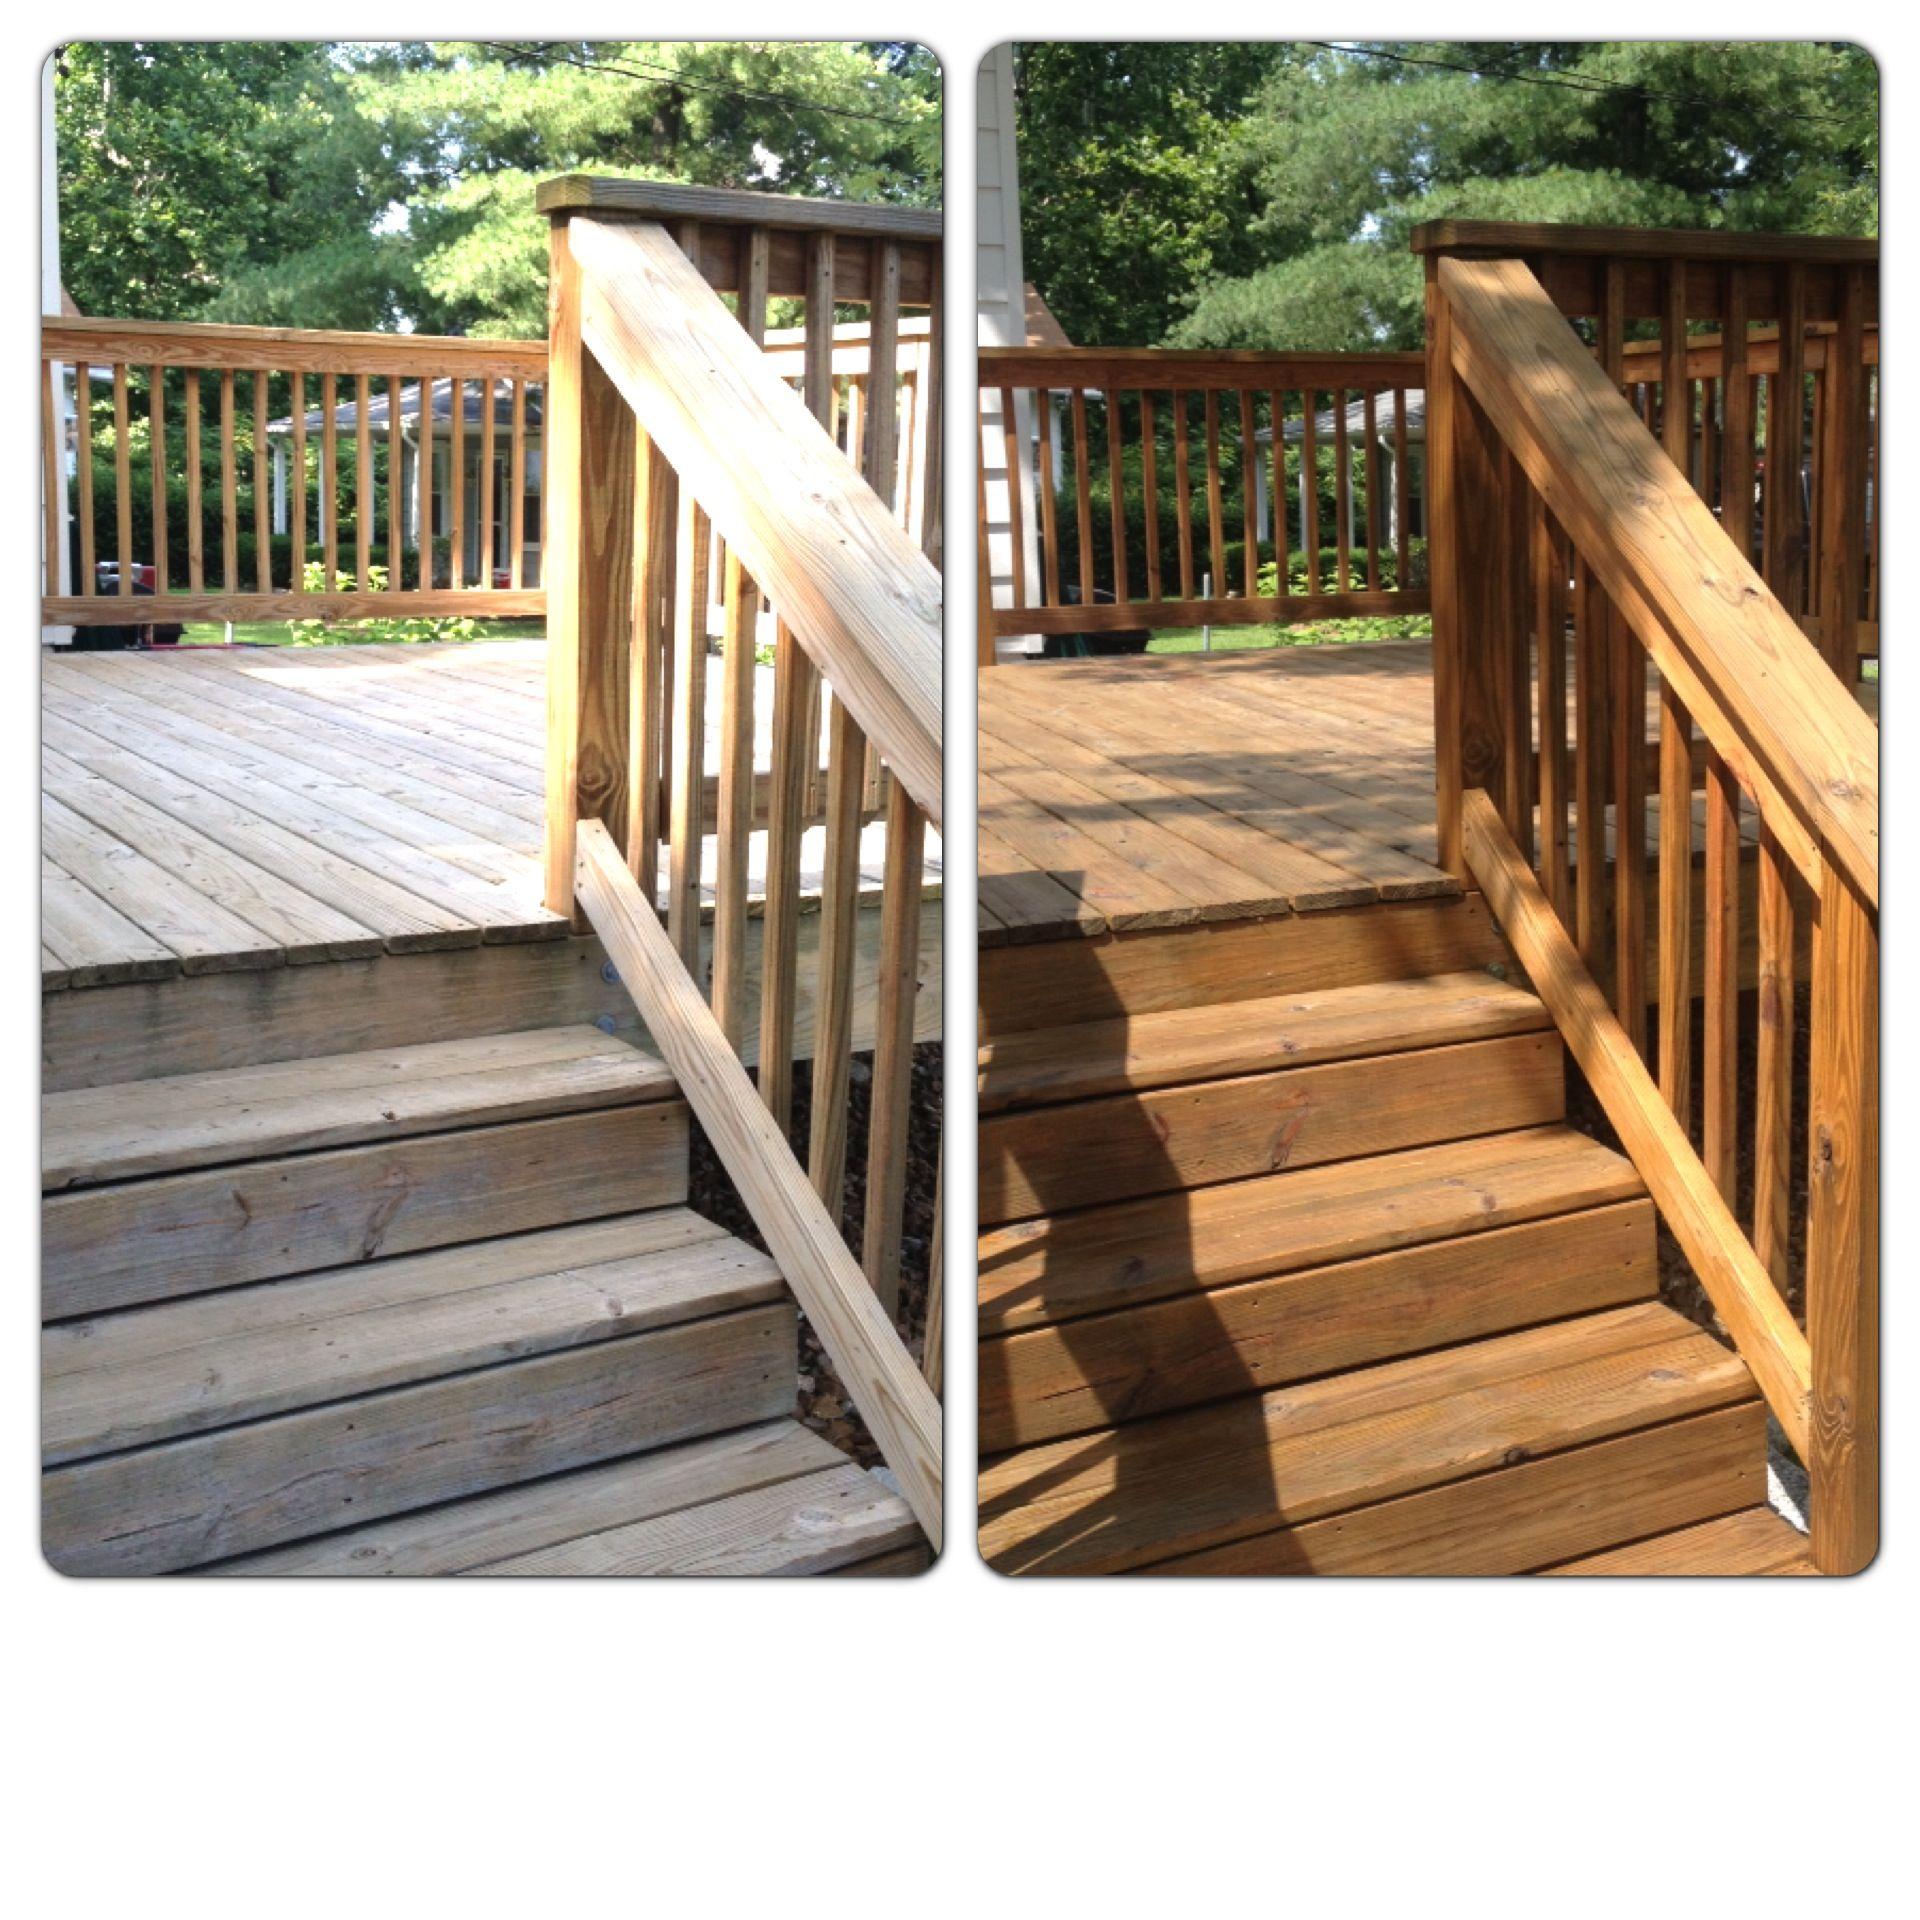 Sherwin Williams Deckscapes Cedar Oil Based Deck Stain Toner